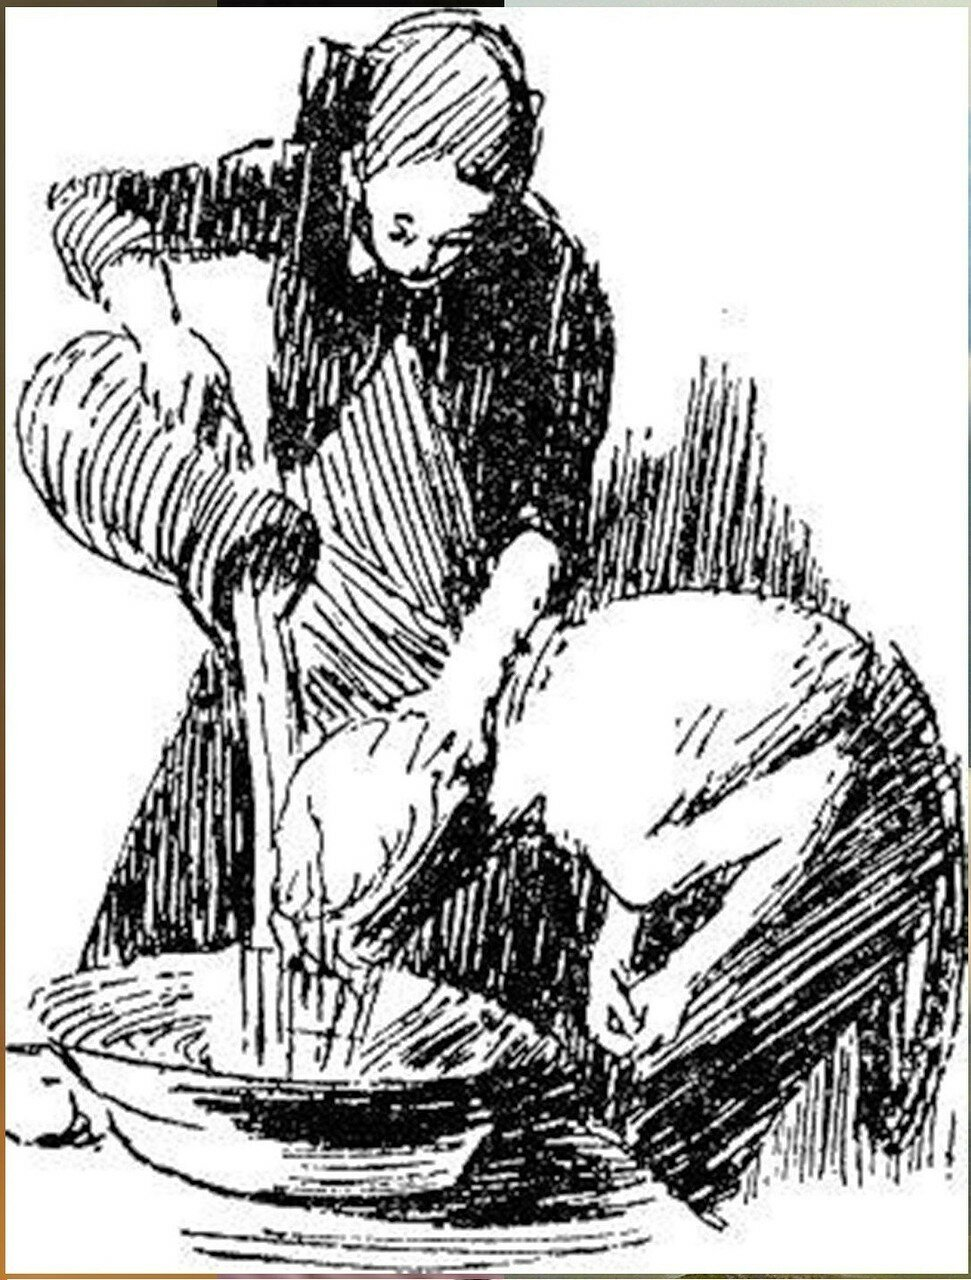 Иллюстрация В. Н. Горяева к пр-ю М.Твена Приключения Тома Сойера (9).jpg